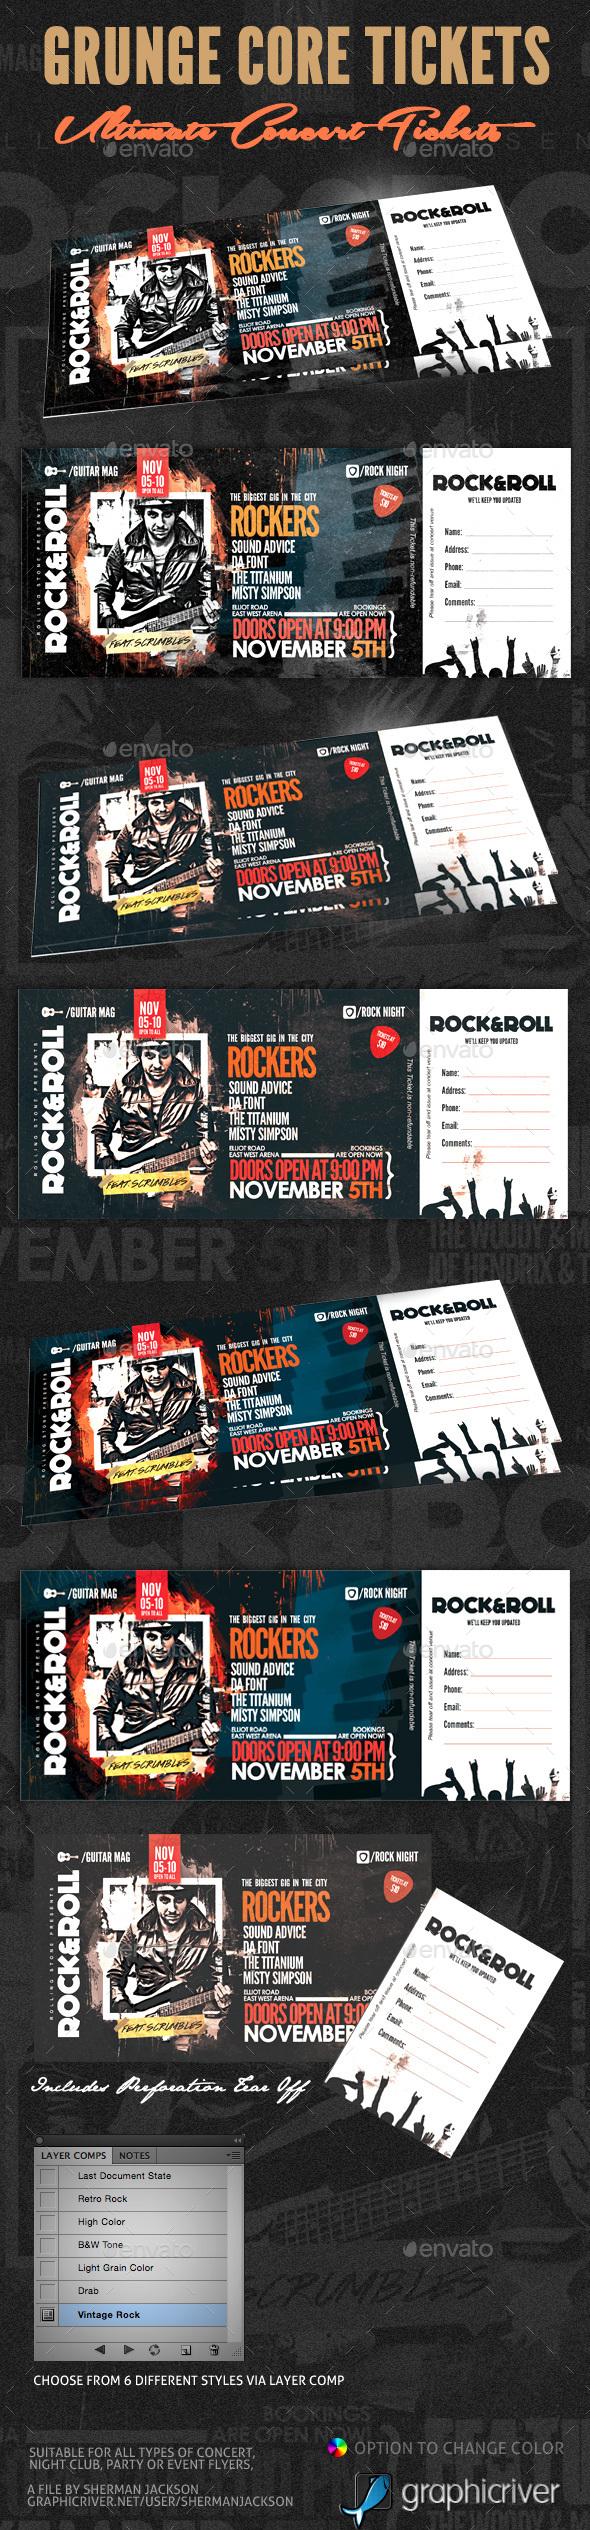 Grunge Core Concert Event Tickets - Miscellaneous Print Templates